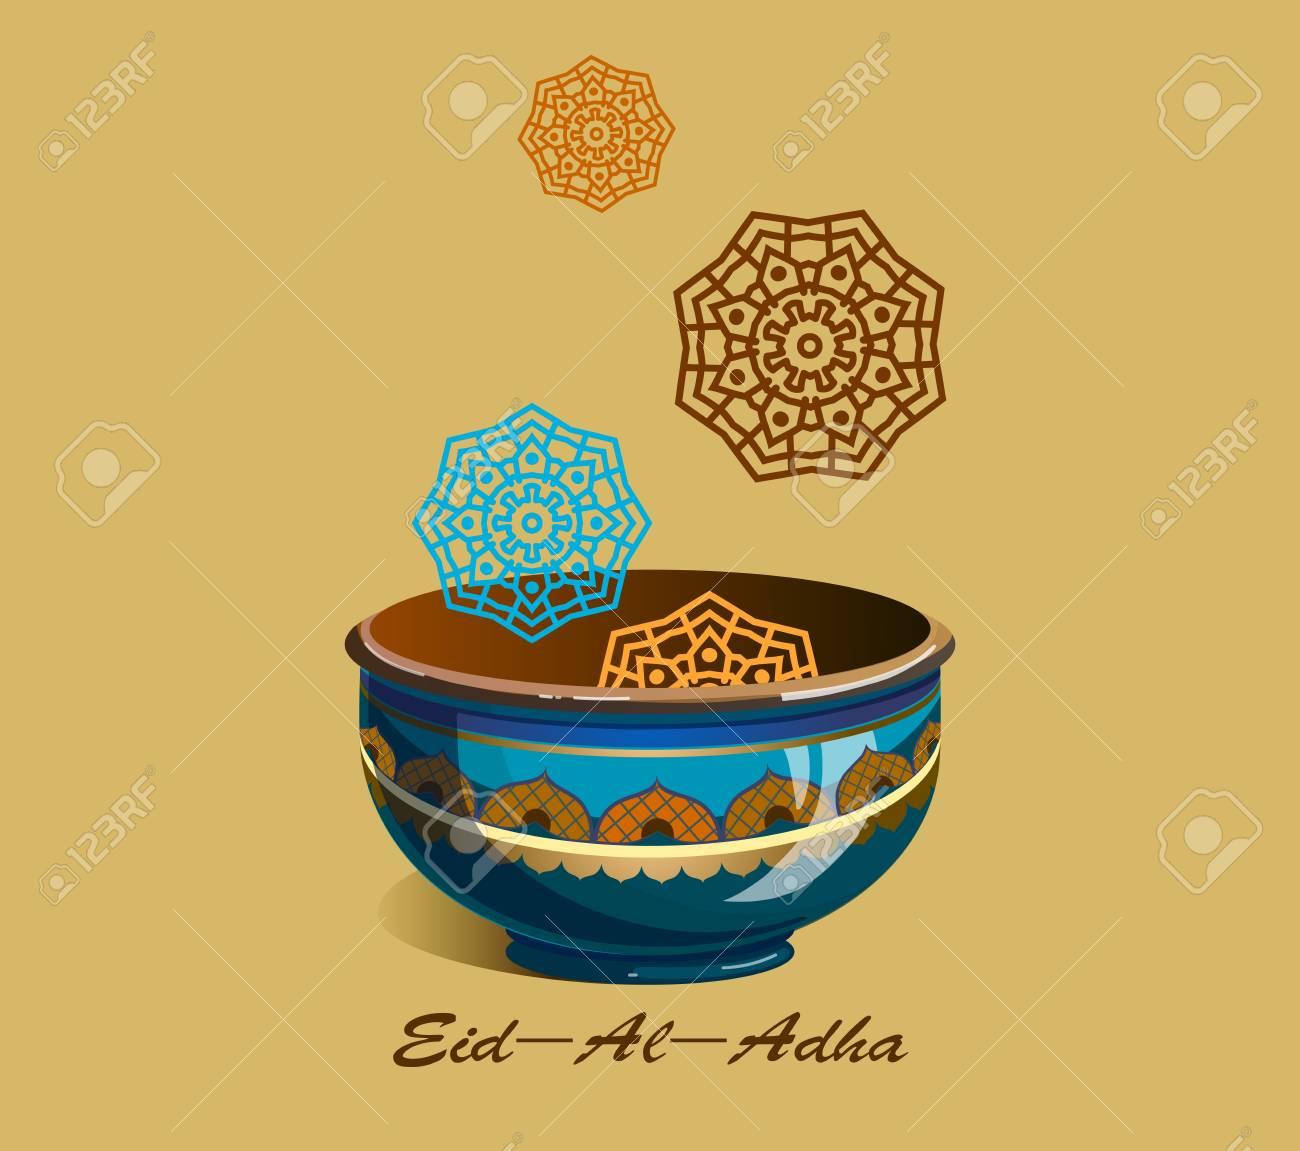 Fantastic Hajj Eid Al-Fitr Decorations - 70932069-muslim-festival-eid-al-adha-eid-al-fitr-eid-mubarak-illustration-vector-holiday-ornament-on-a-bowl  Photograph_975466 .jpg